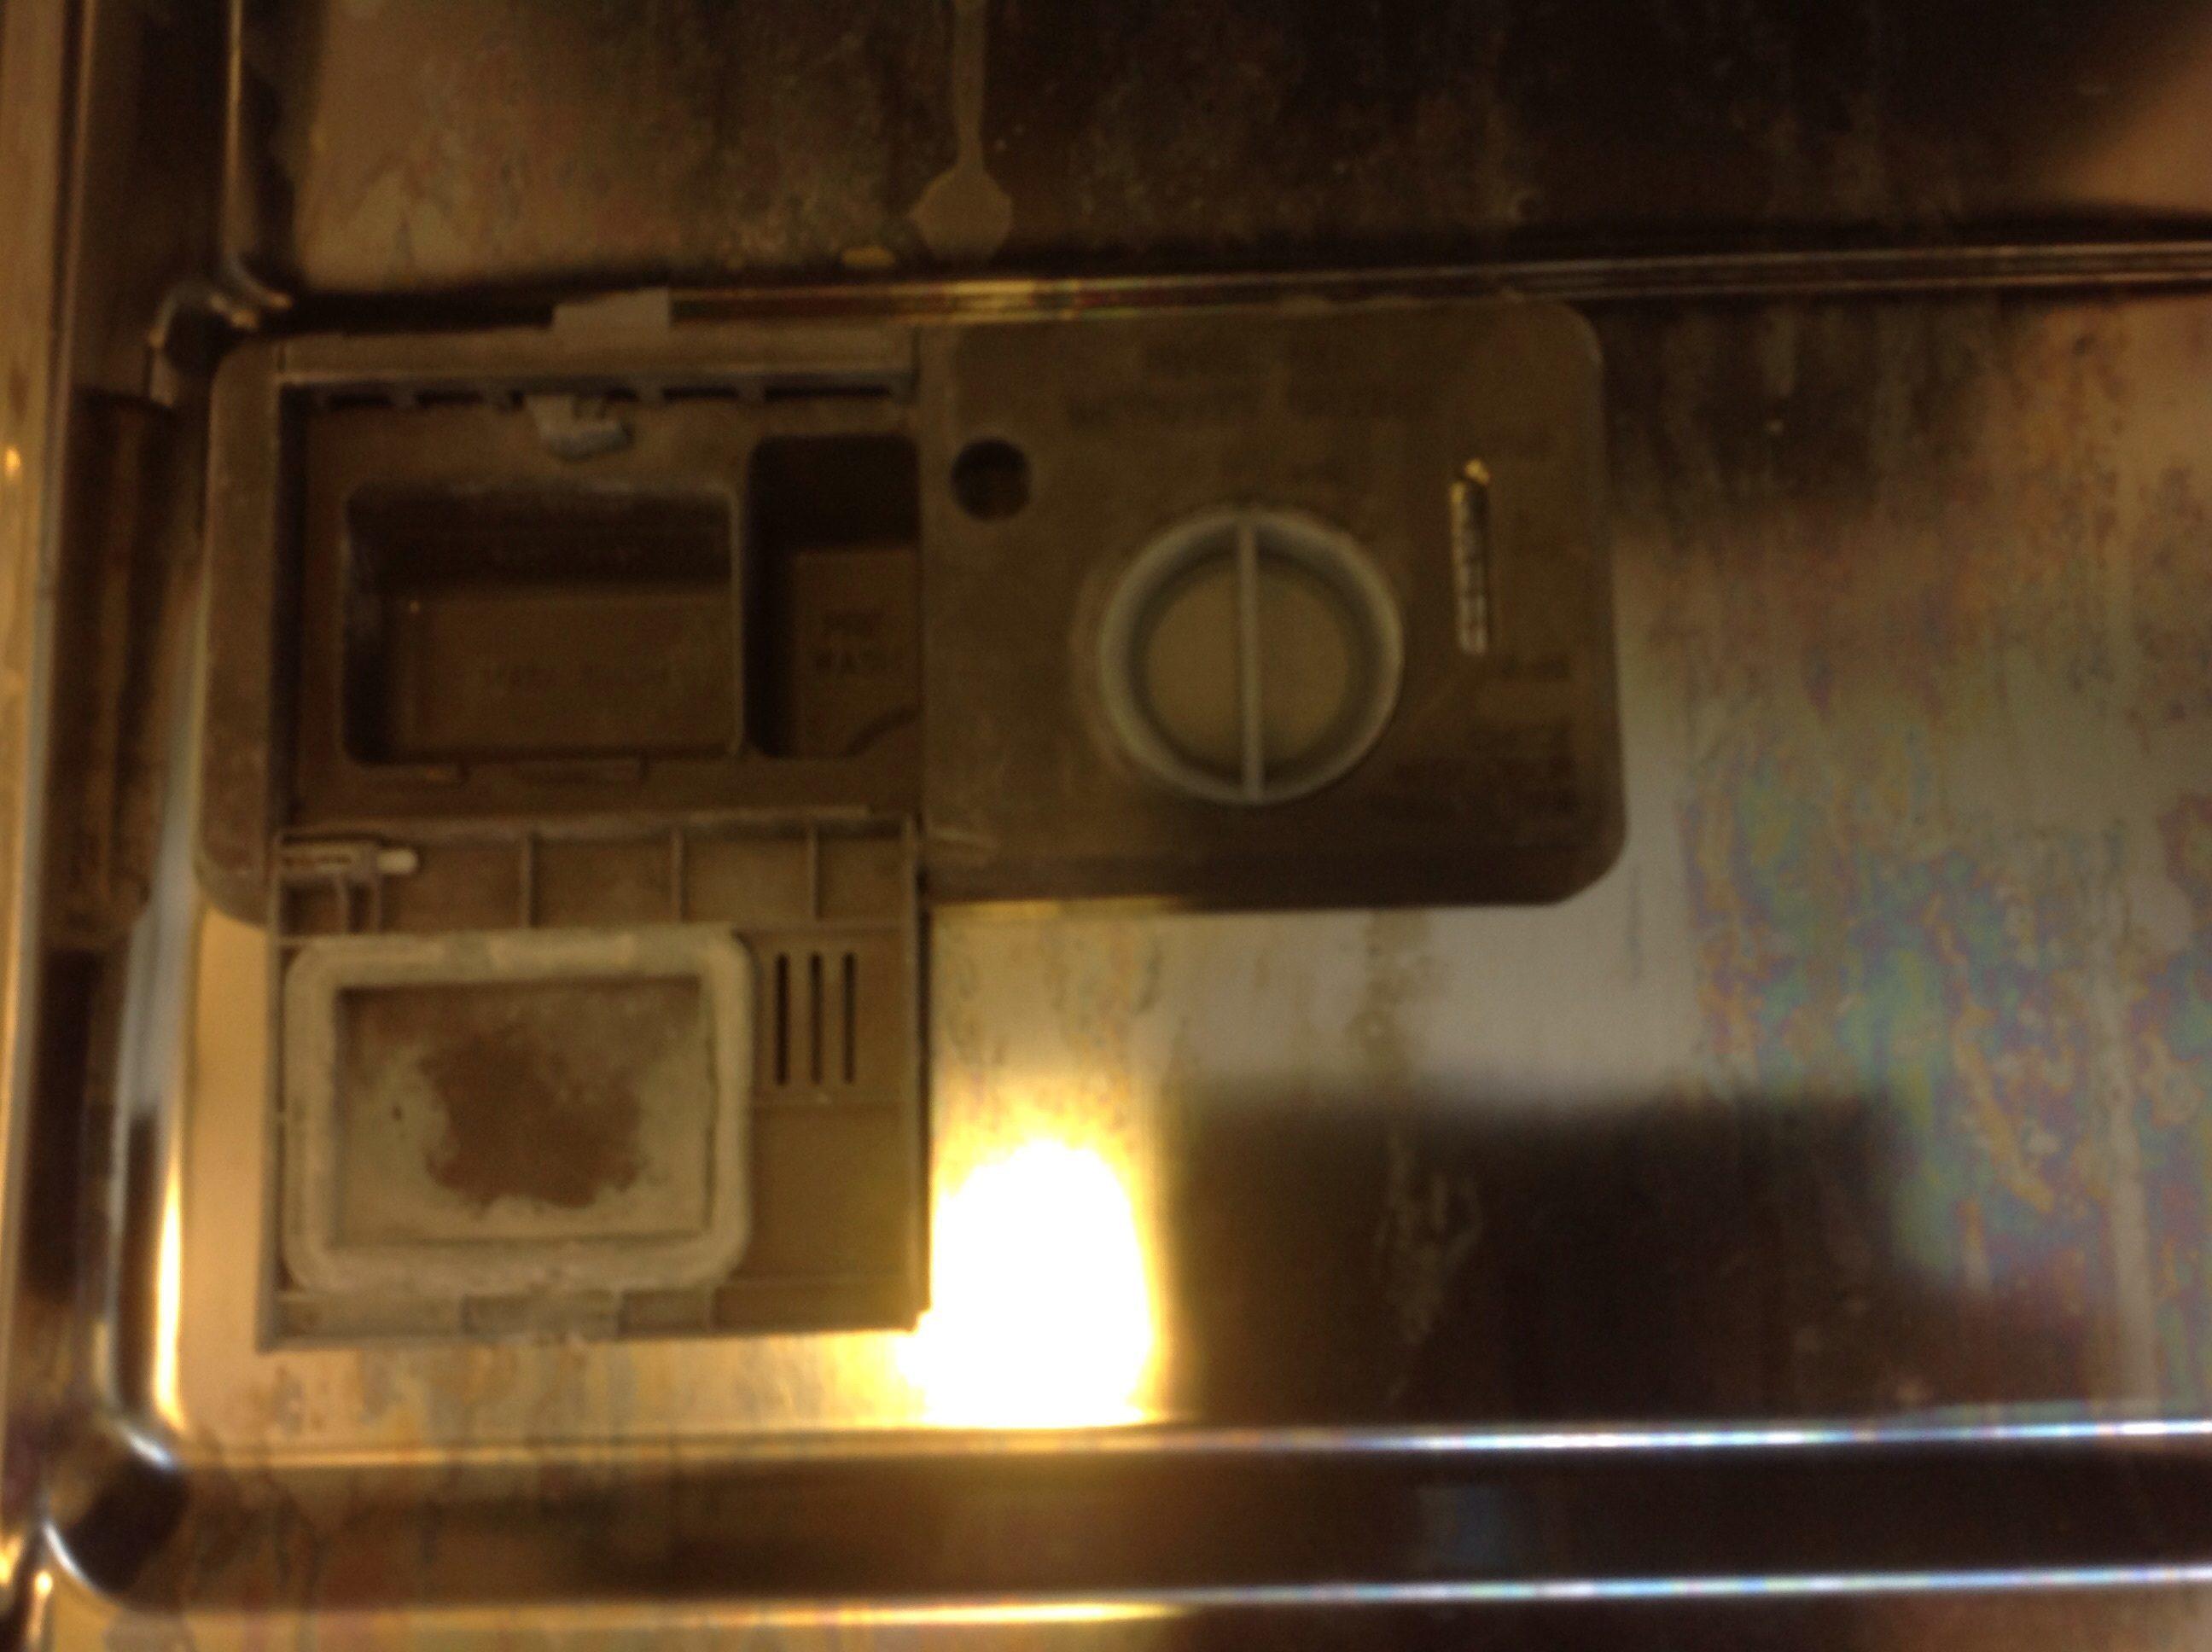 Maytag Dishwashers on Maytag Dishwashers Recall